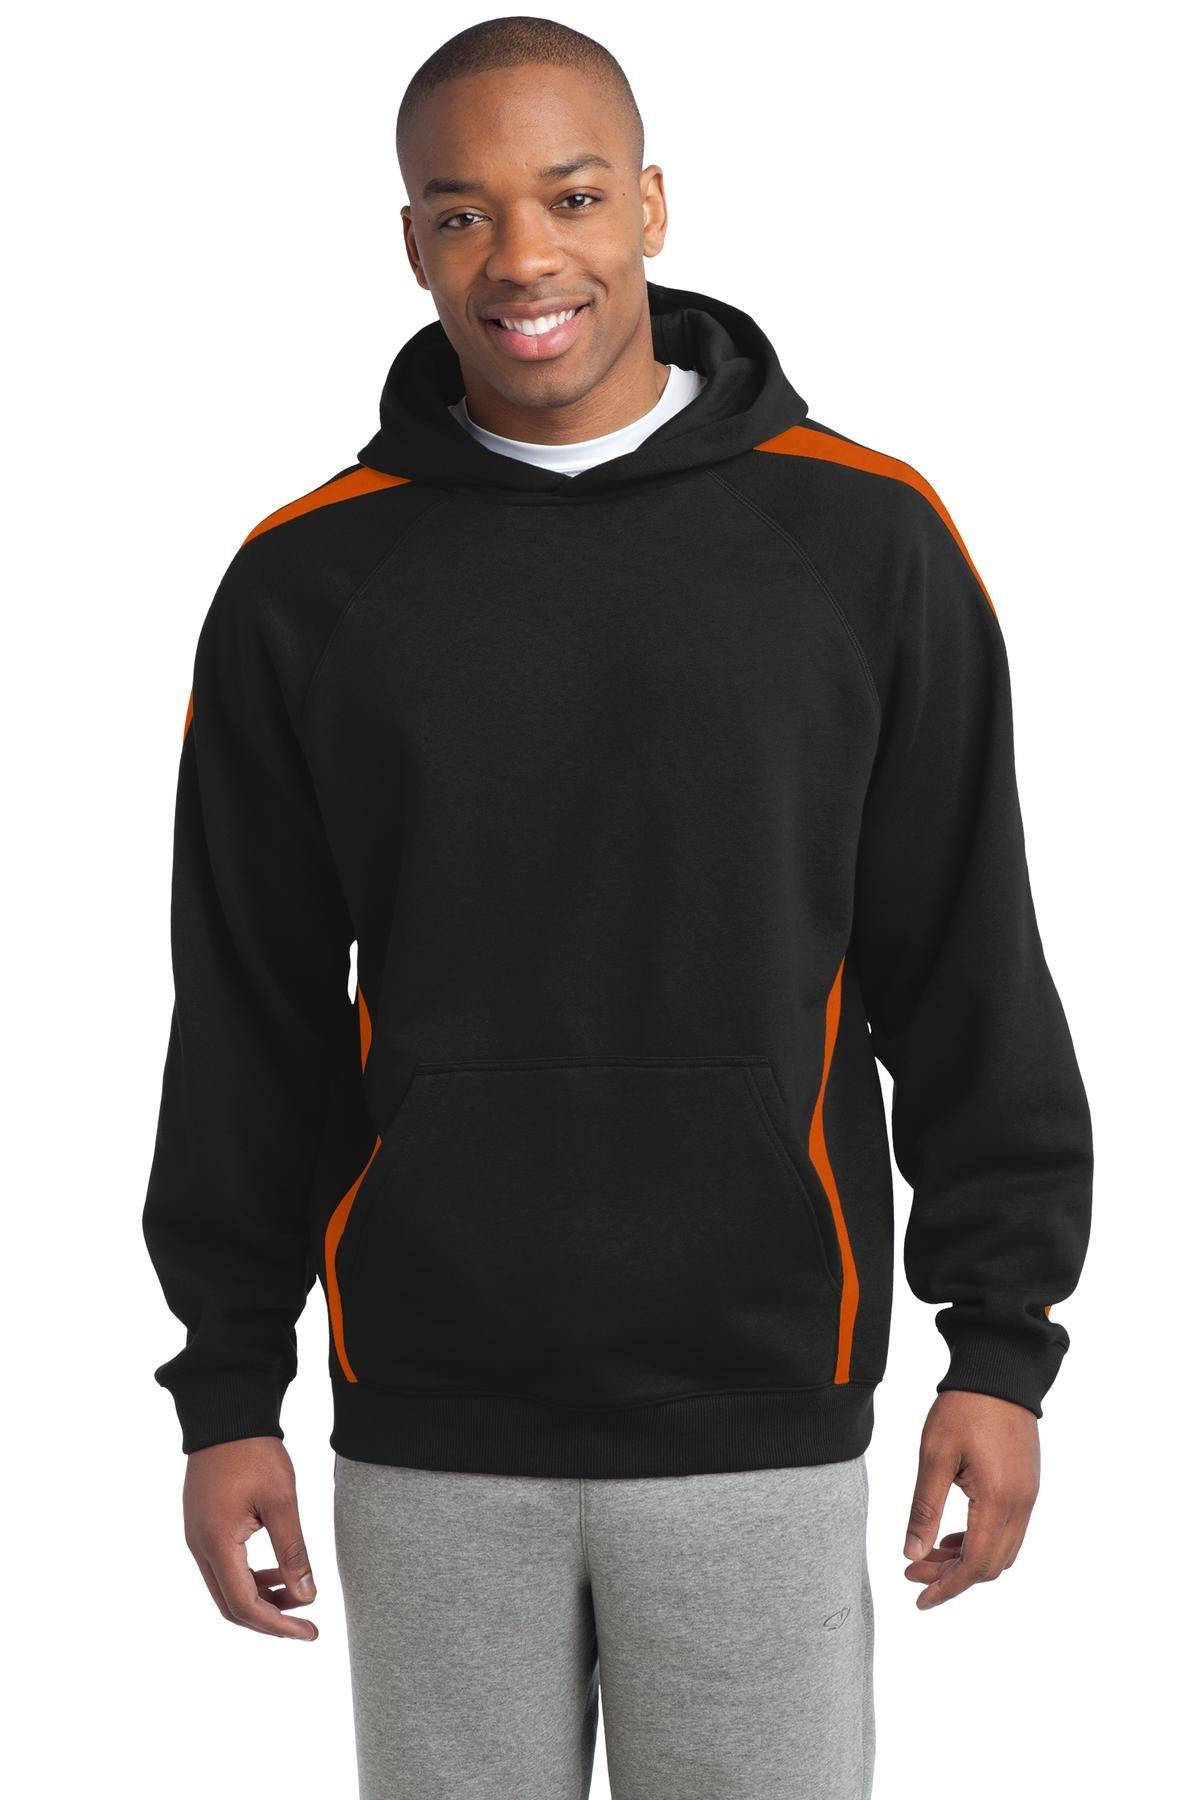 Sport-Tek Men's Sleeve Stripe Pullover Hooded Sweatshirt XL Black/Deep Orange by Sport-Tek